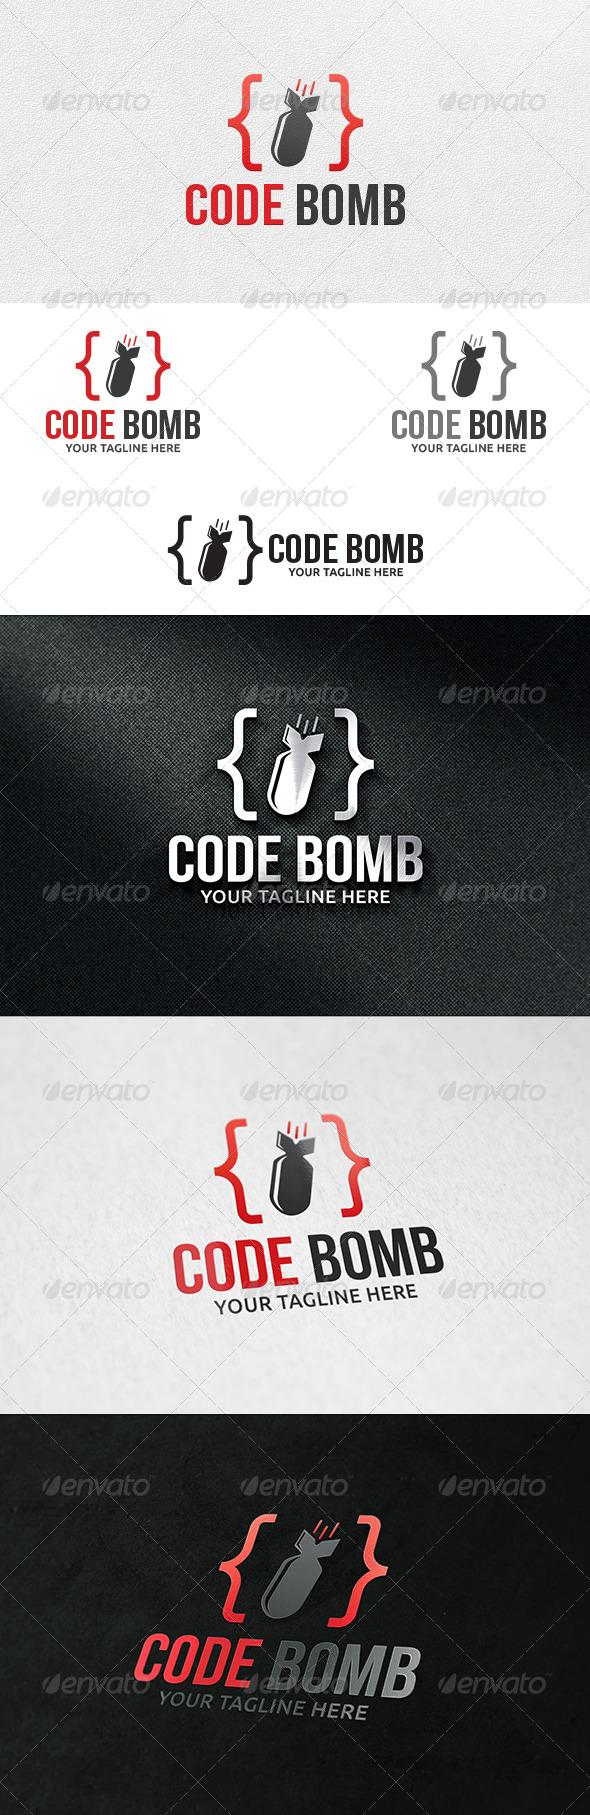 Code Bomb - Logo Template - Symbols Logo Templates